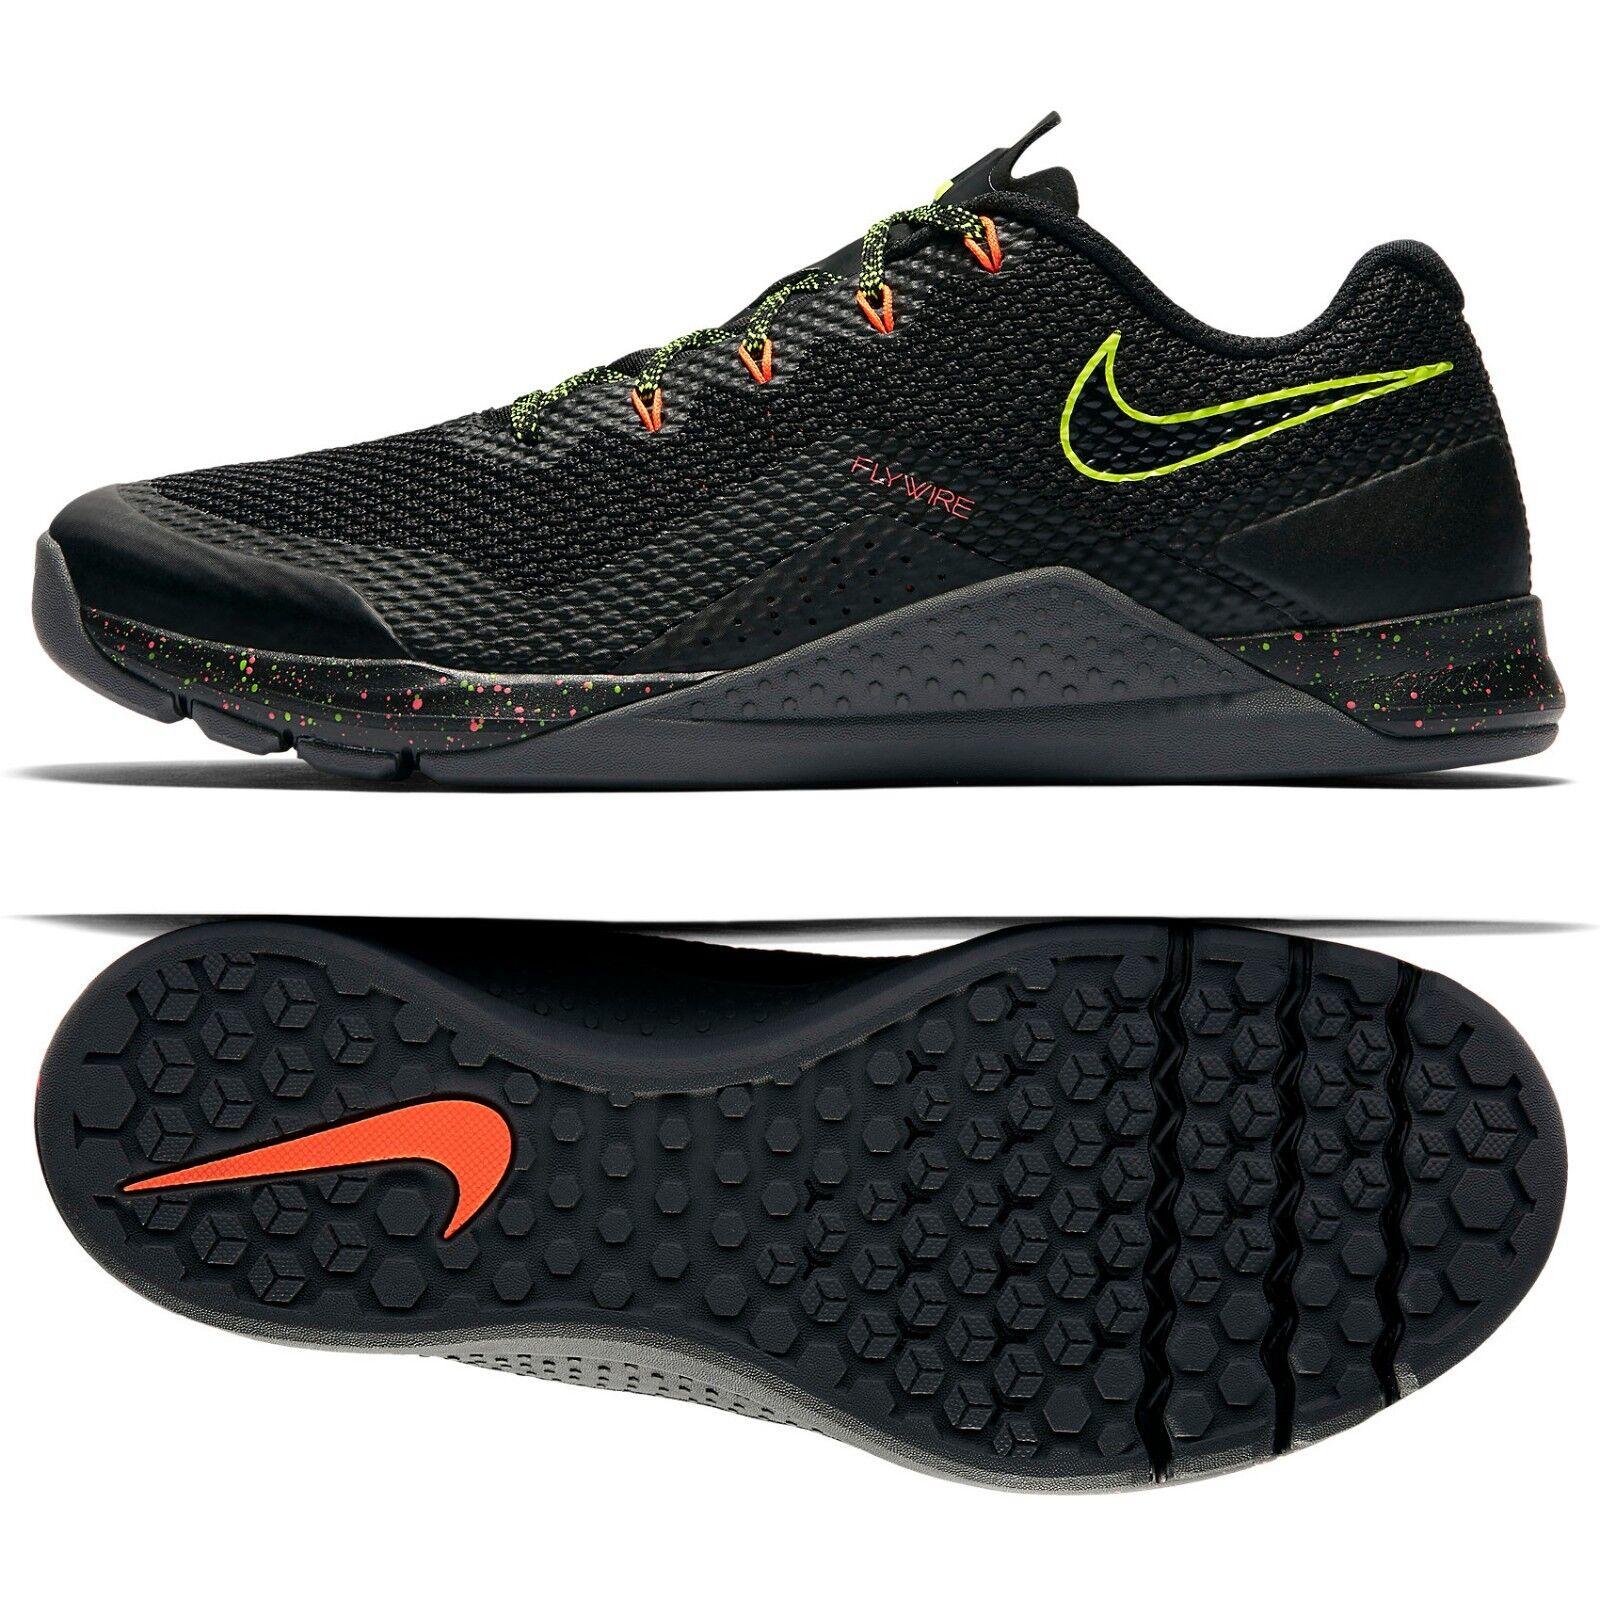 Nike Metcon Repper DSX 898048-007 Black/Volt/Crimson Men Training Shoes Sz 10.5 best-selling model of the brand